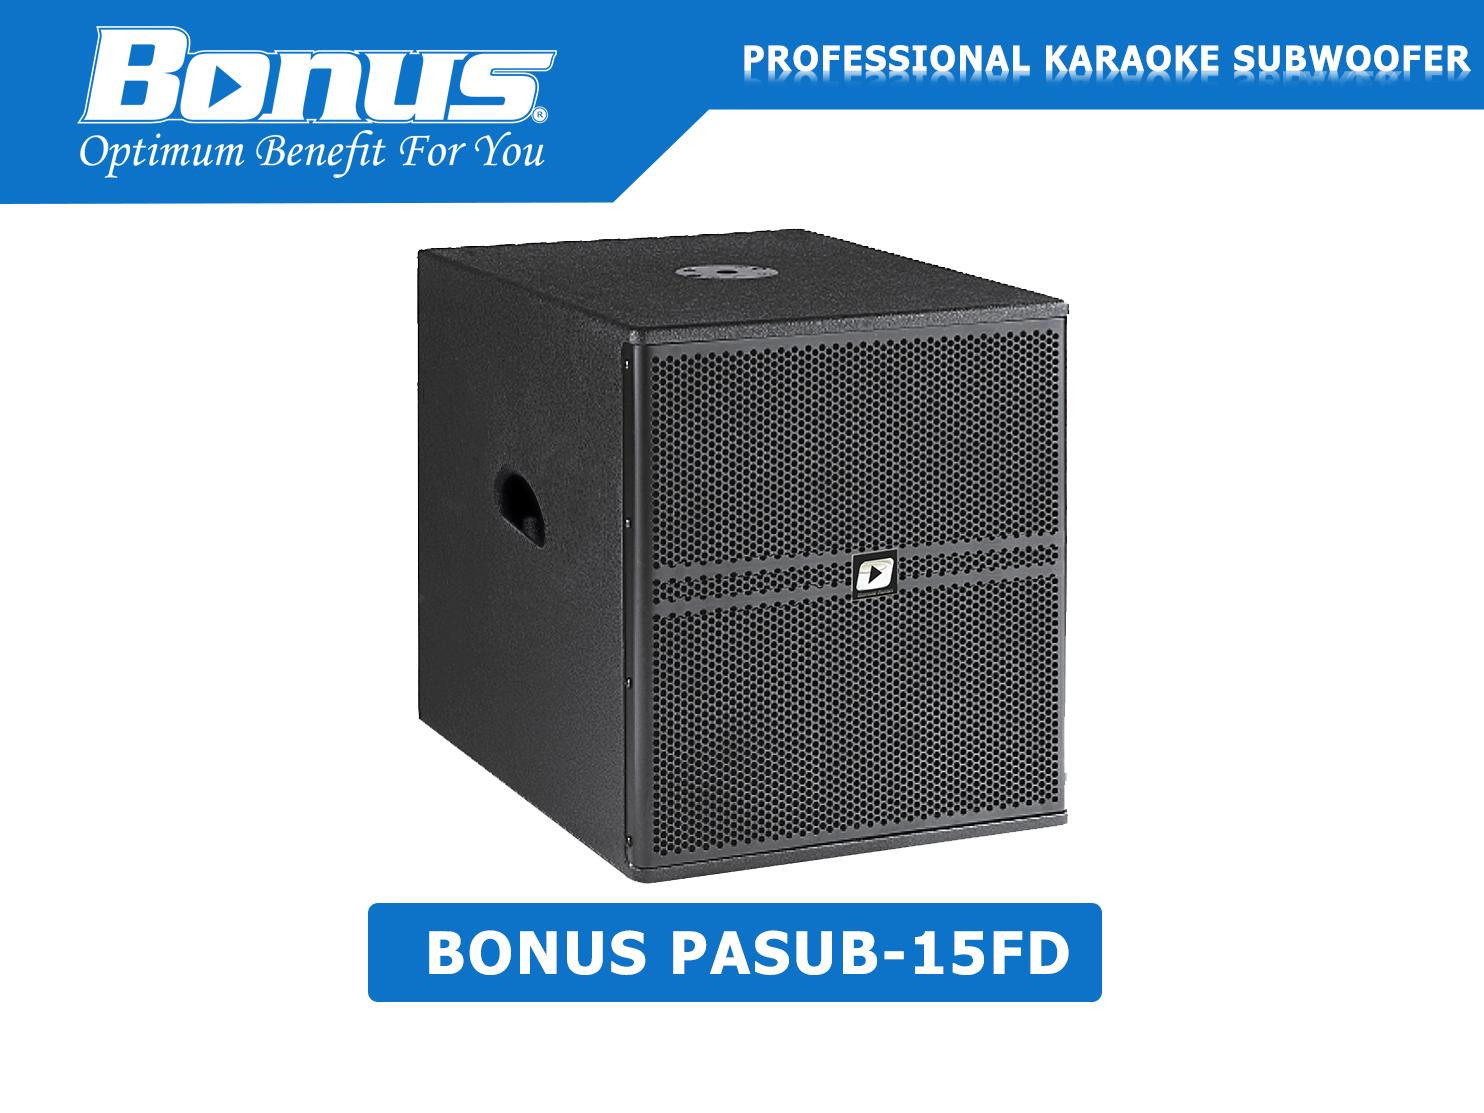 Loa Subwoofer Bonus PASUB-15FD